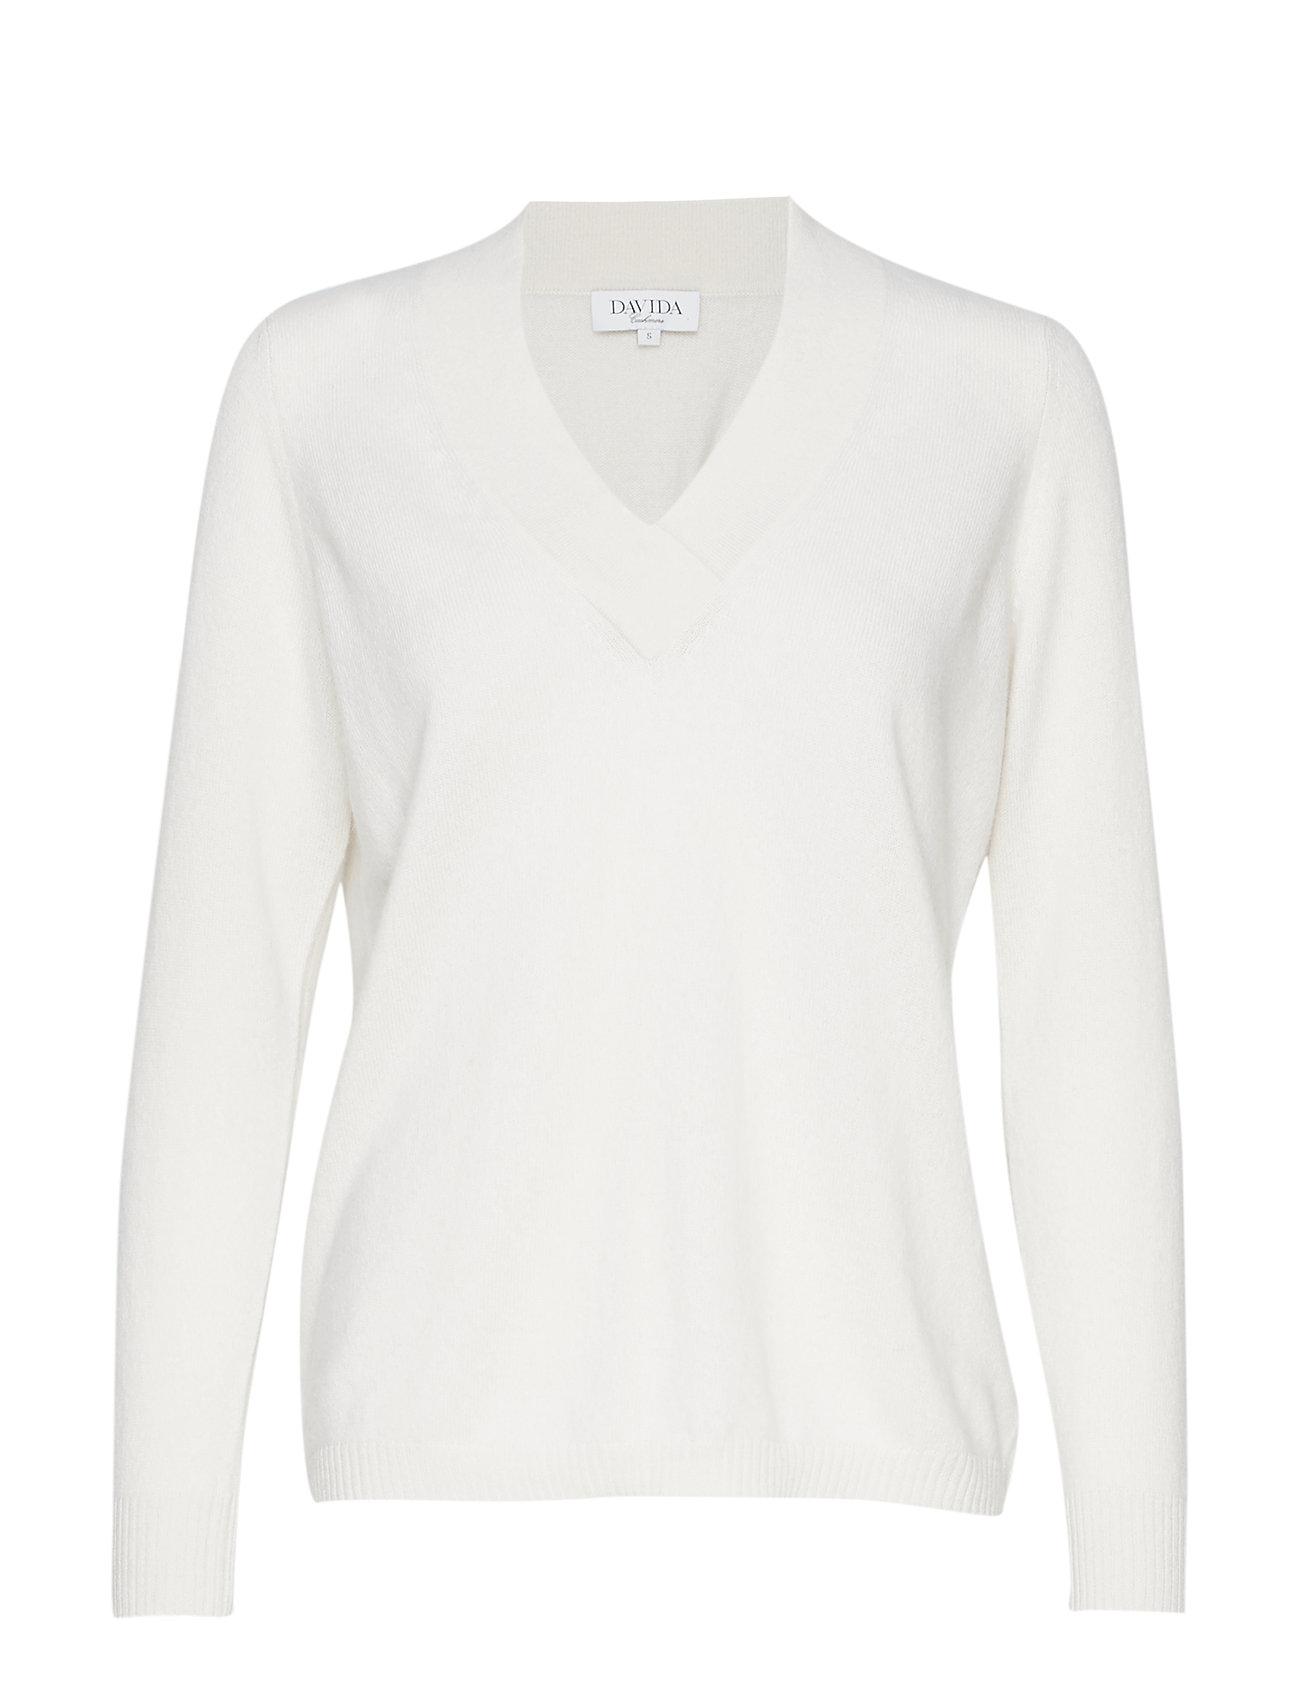 Davida Cashmere V-neck oversized sweater - WHITE